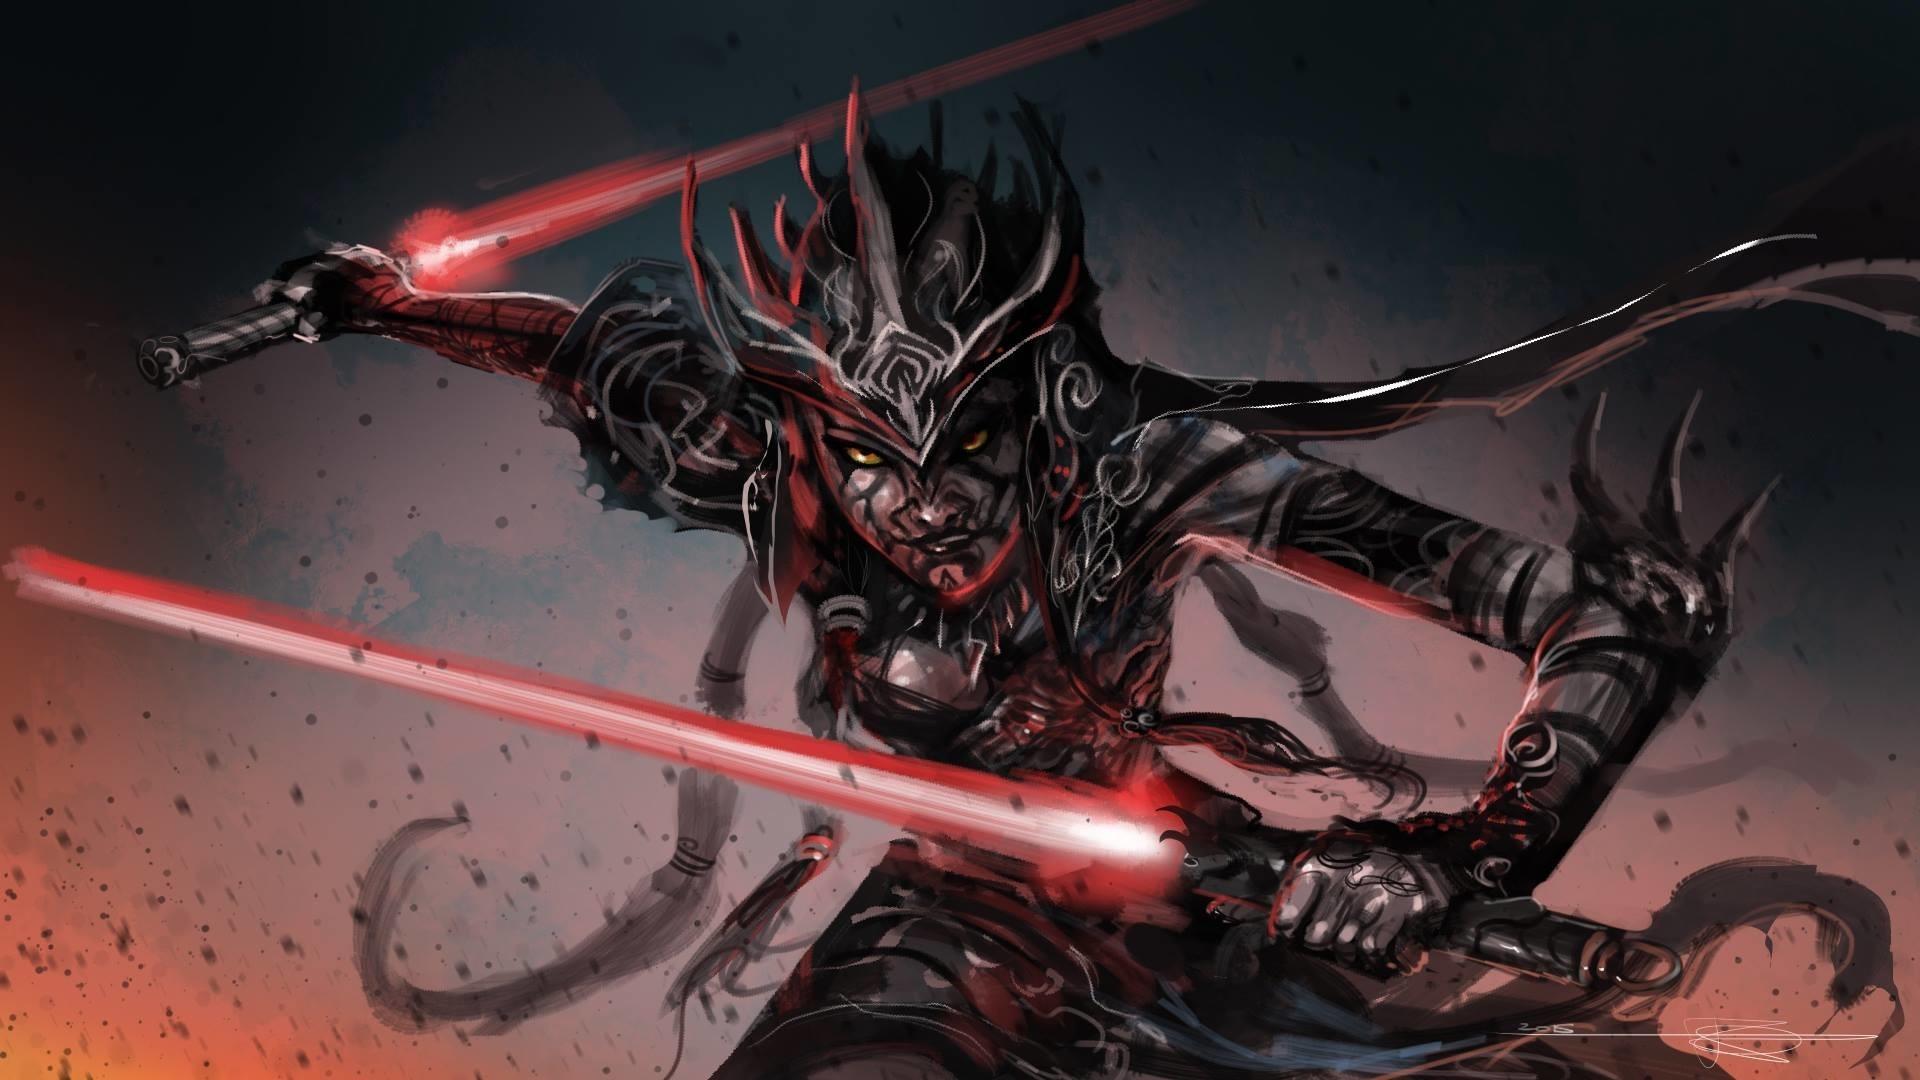 Wallpaper Star Wars Fantasy Art Artwork Sith Lightsaber Demon